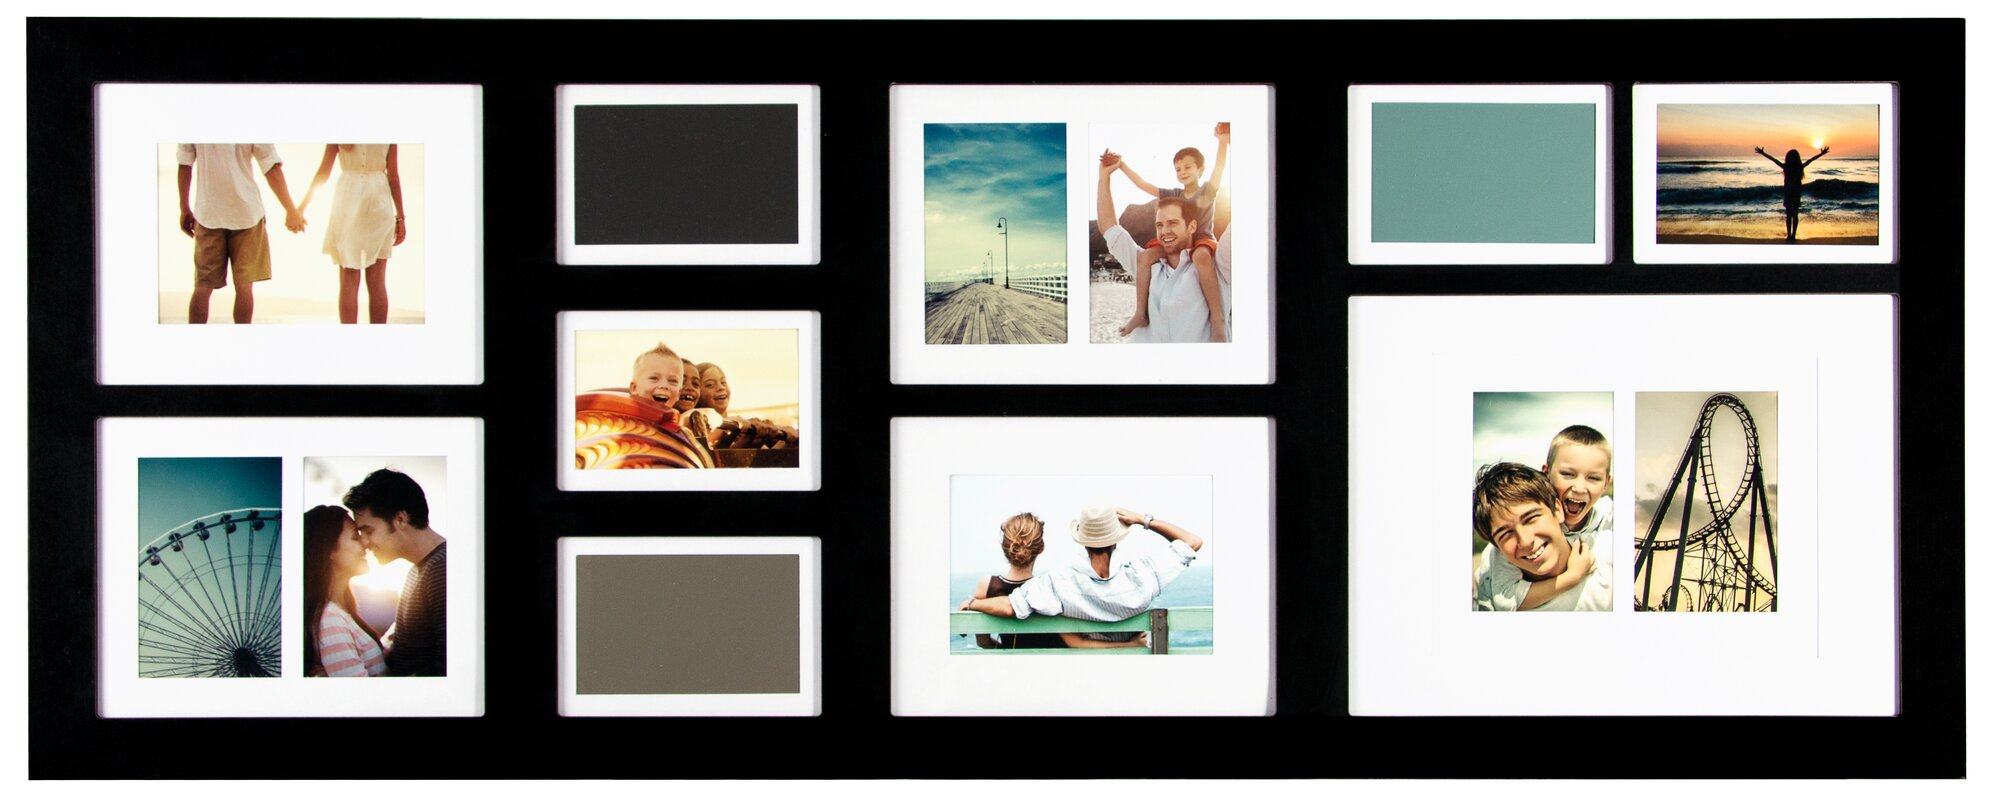 Nielsenbainbridge pinnacle 10 opening collage picture frame pinnacle 10 opening collage picture frame jeuxipadfo Image collections